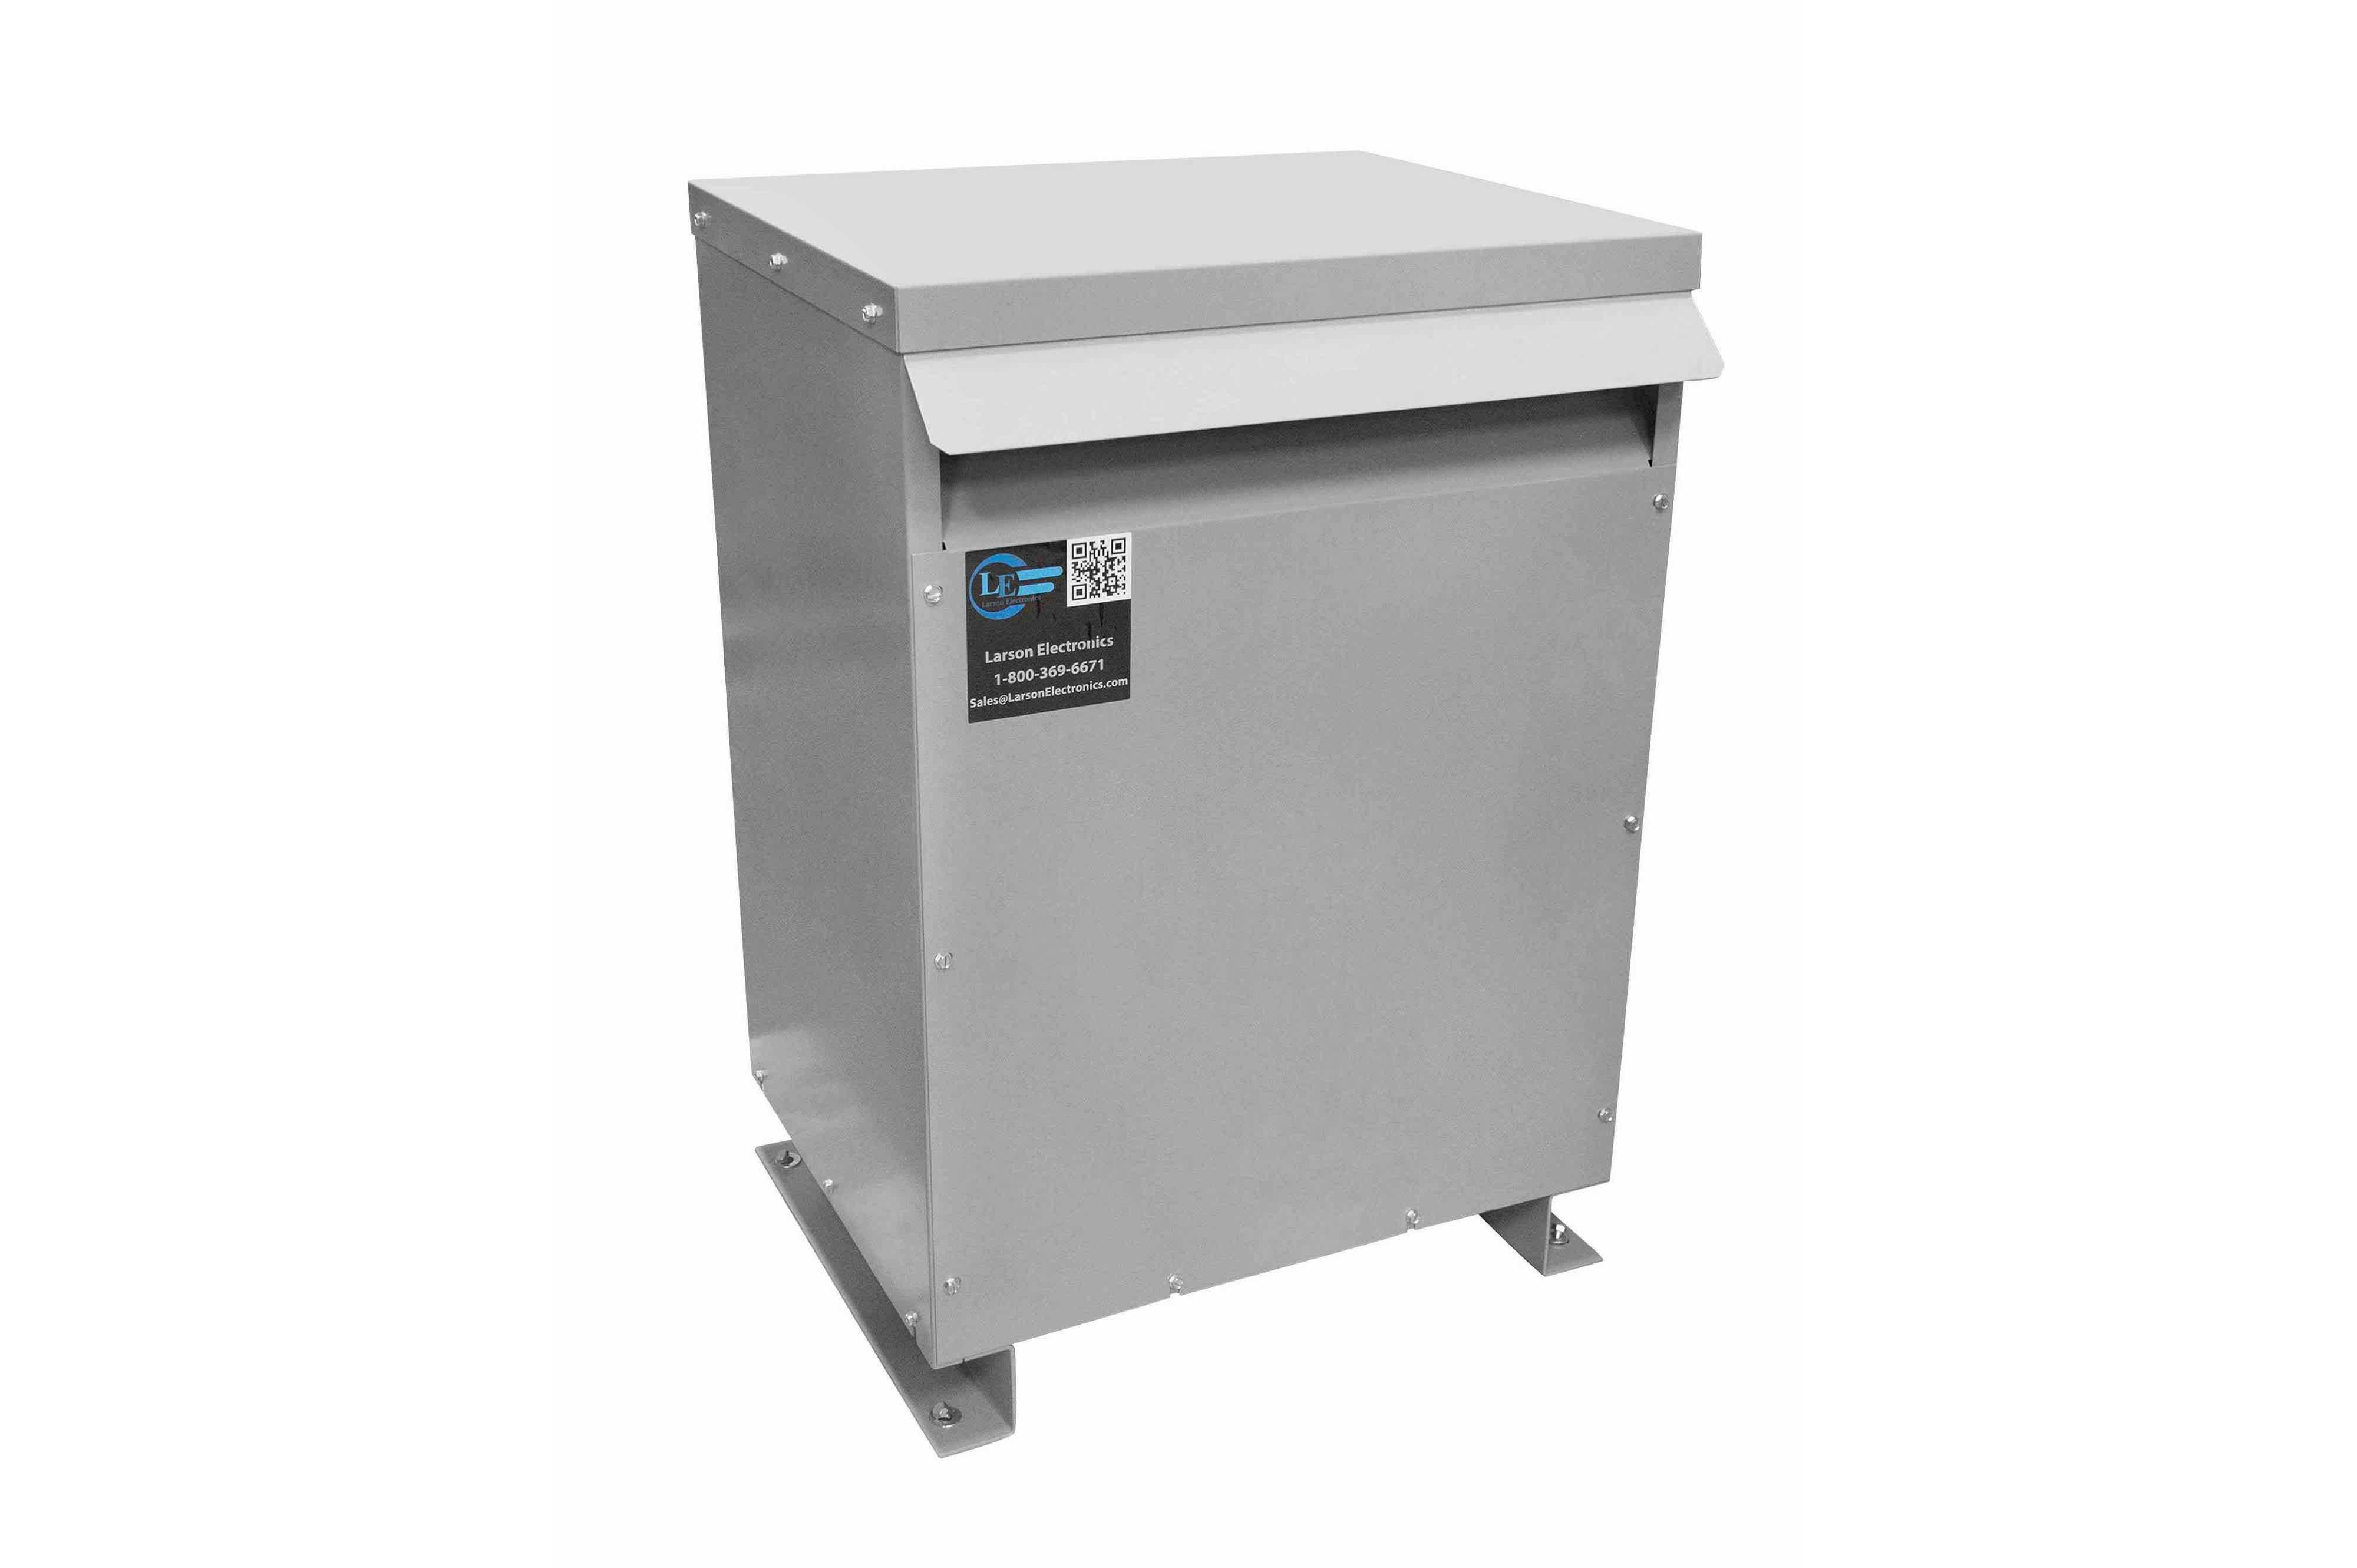 70 kVA 3PH Isolation Transformer, 575V Wye Primary, 208V Delta Secondary, N3R, Ventilated, 60 Hz